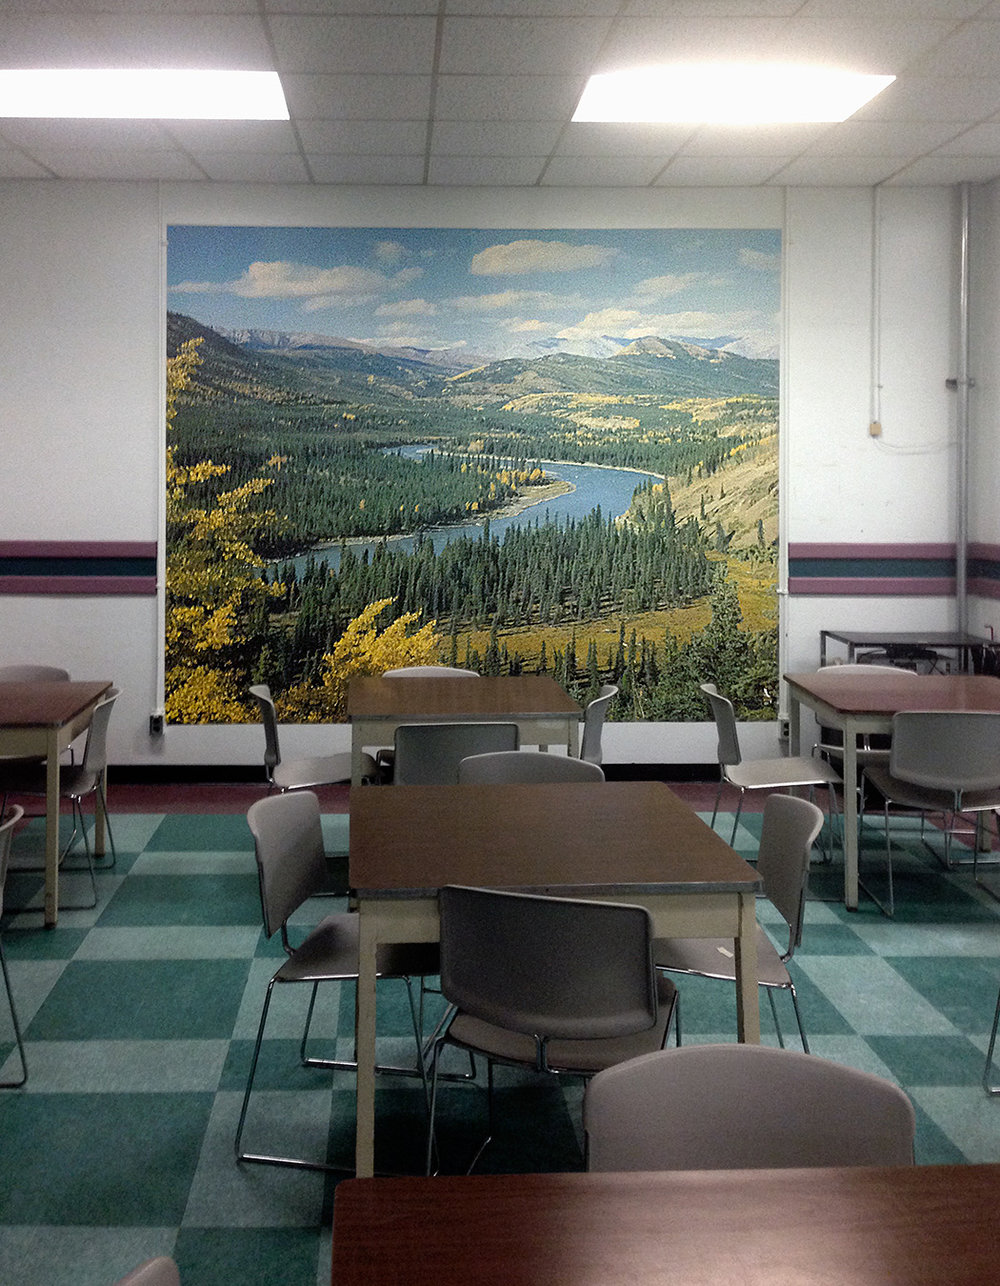 © Douglas Moffat, Cafeteria - Central Emergency Government Headquarters, CFB Carp, Ontario (2015).